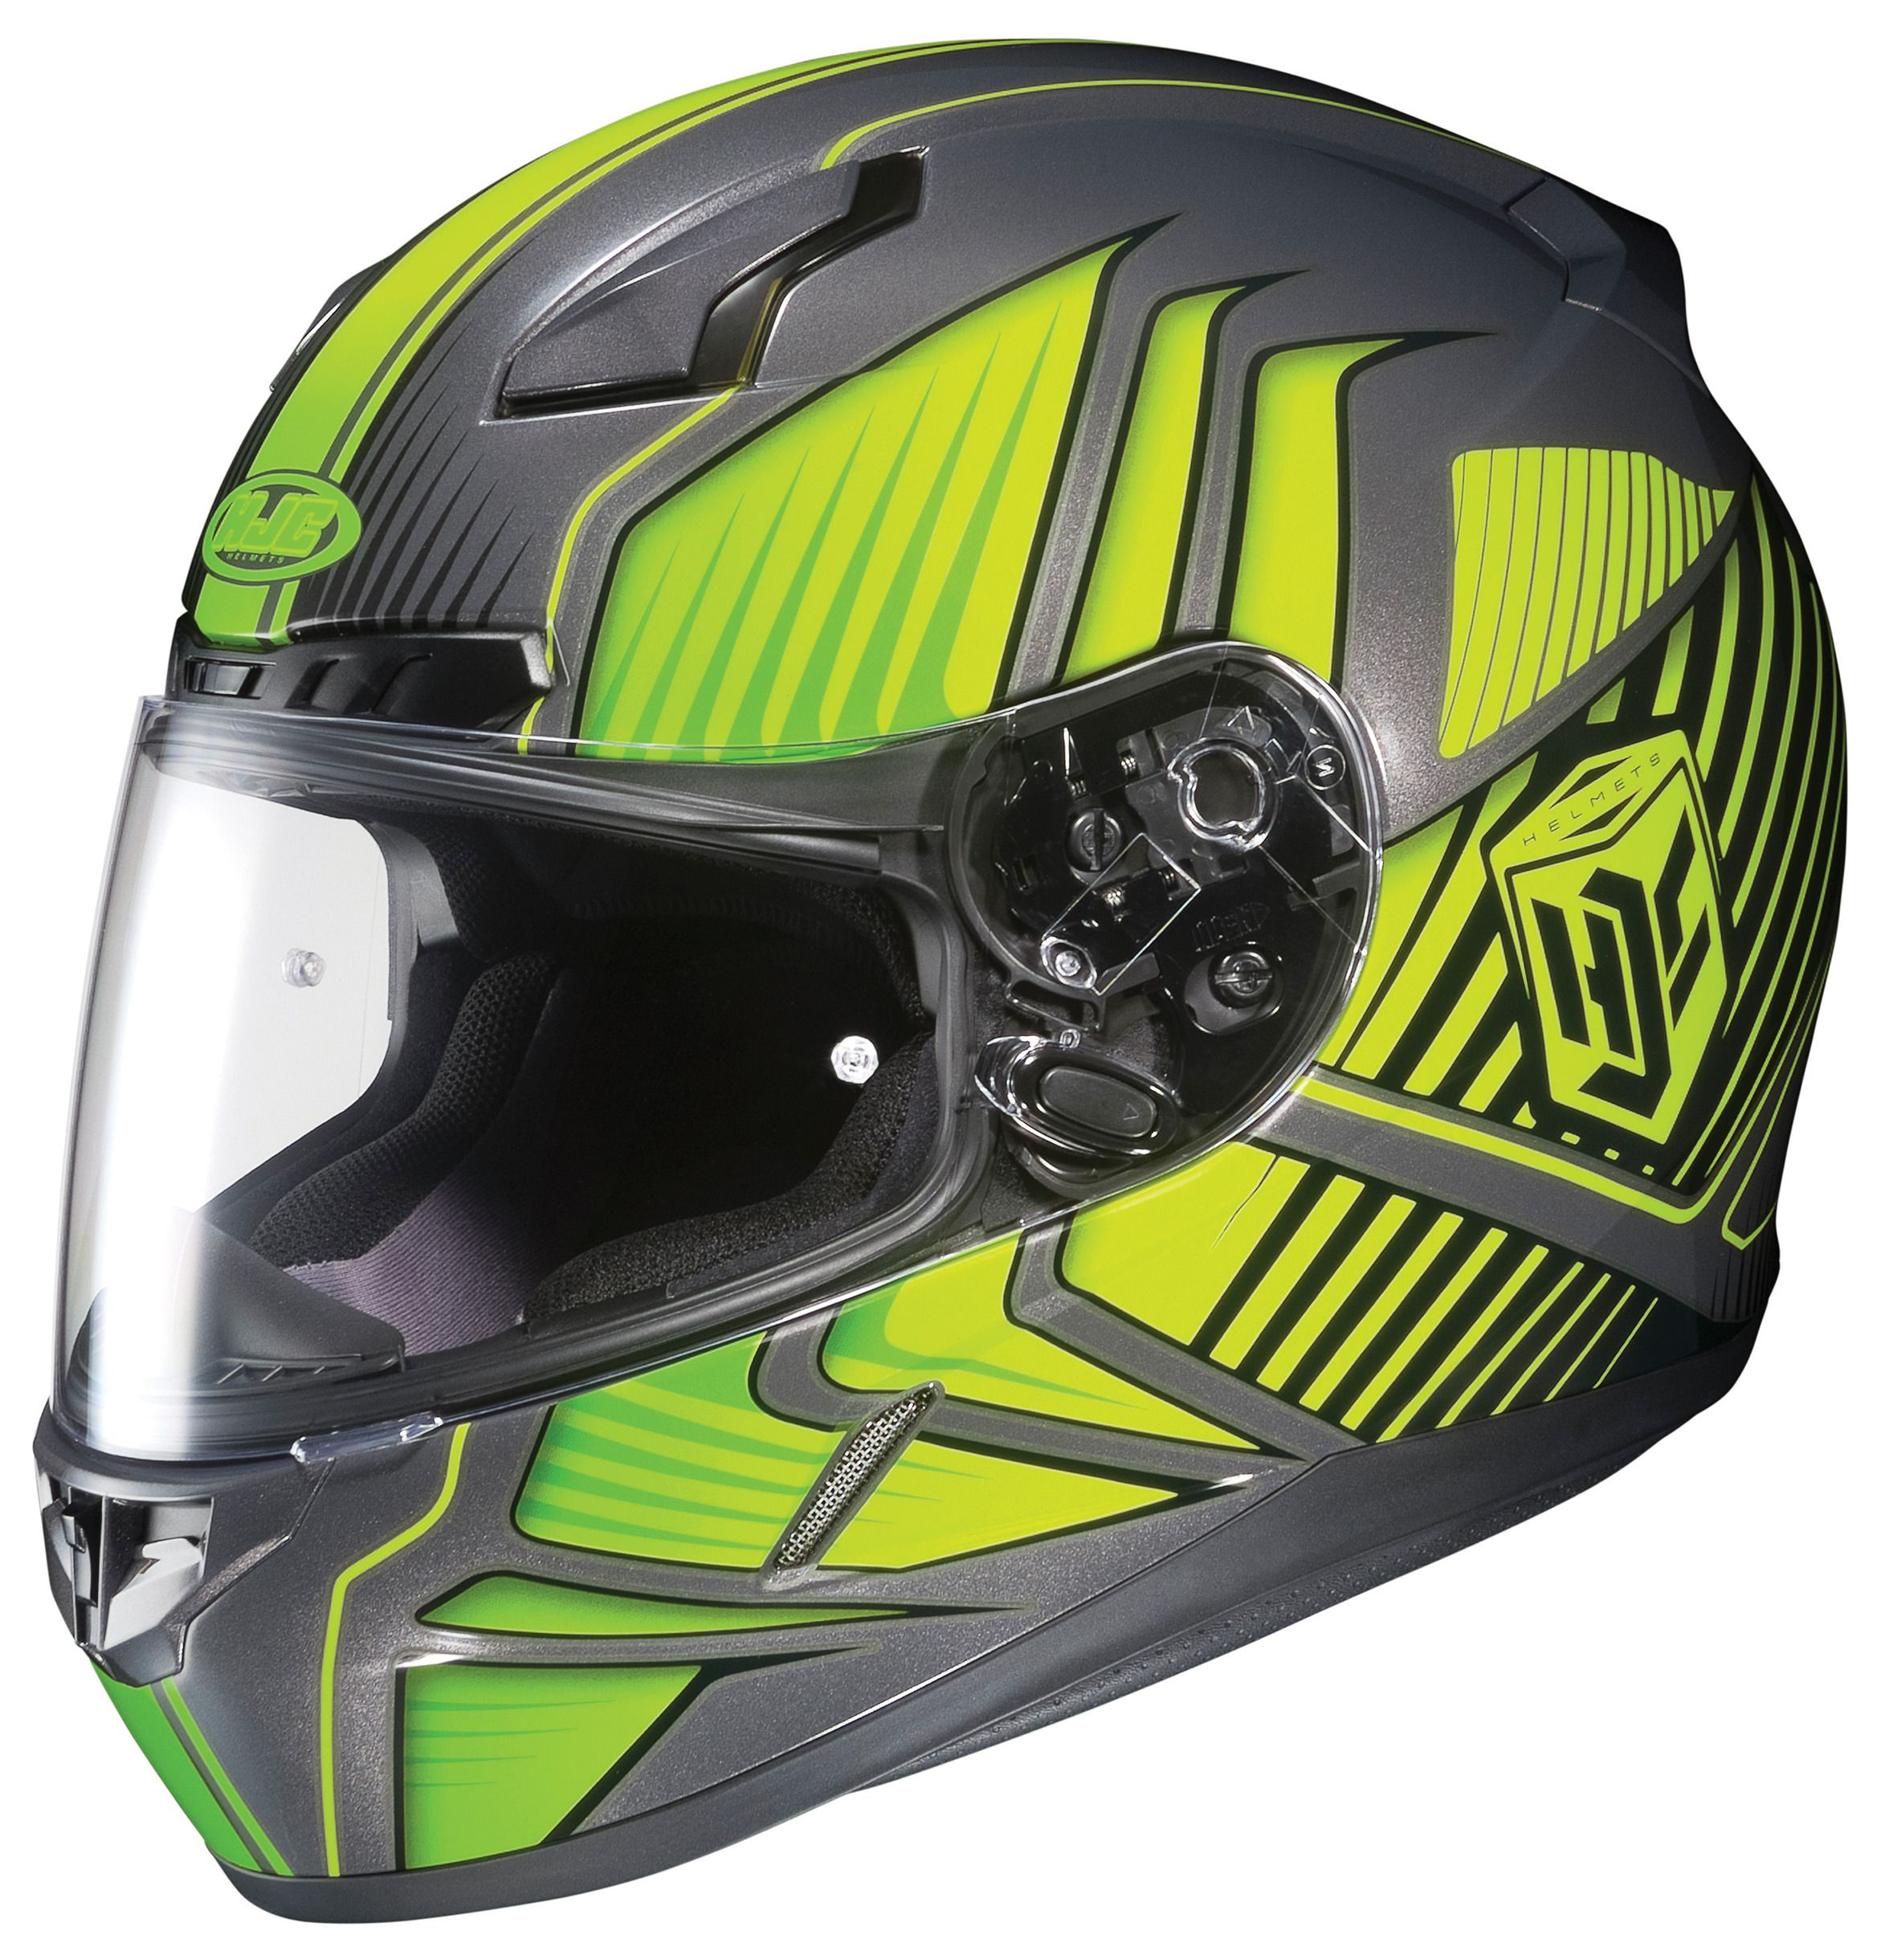 HJC CL Redline HiViz Helmet Size SM Only RevZilla - Motorcycle helmet decals graphicsappliedgraphics high visibility reflective motorcycle decals